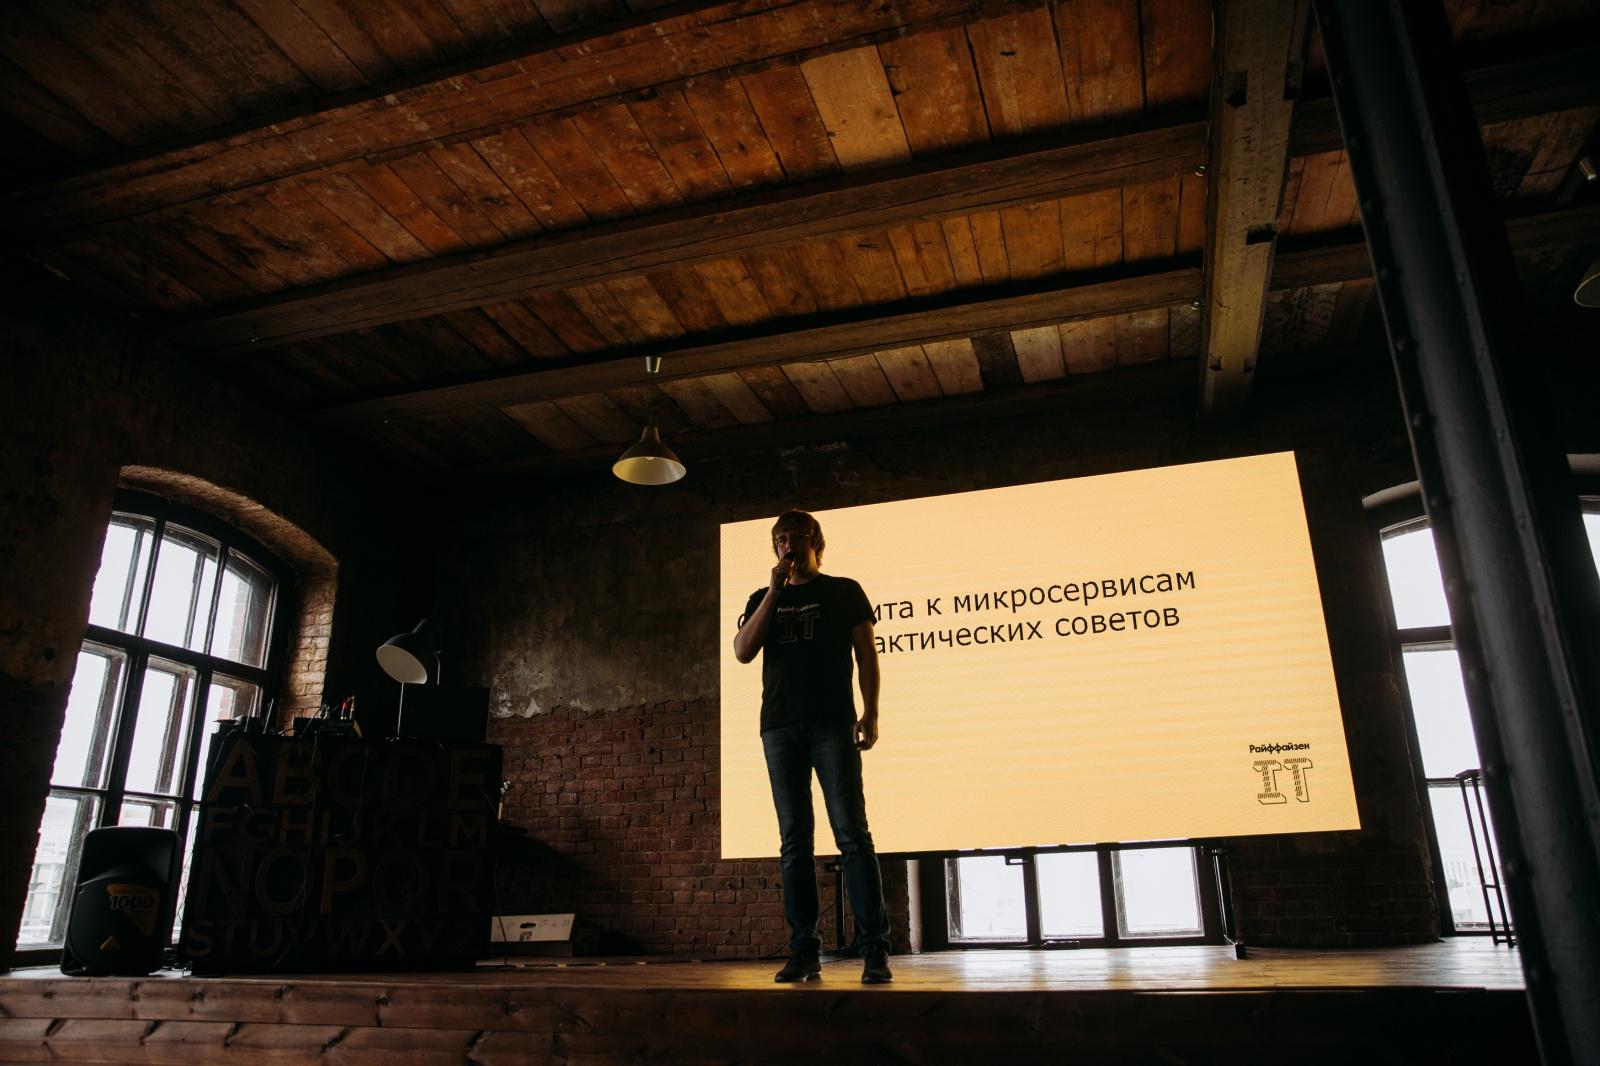 .Net Community Райффайзенбанка приглашает на митап - 1